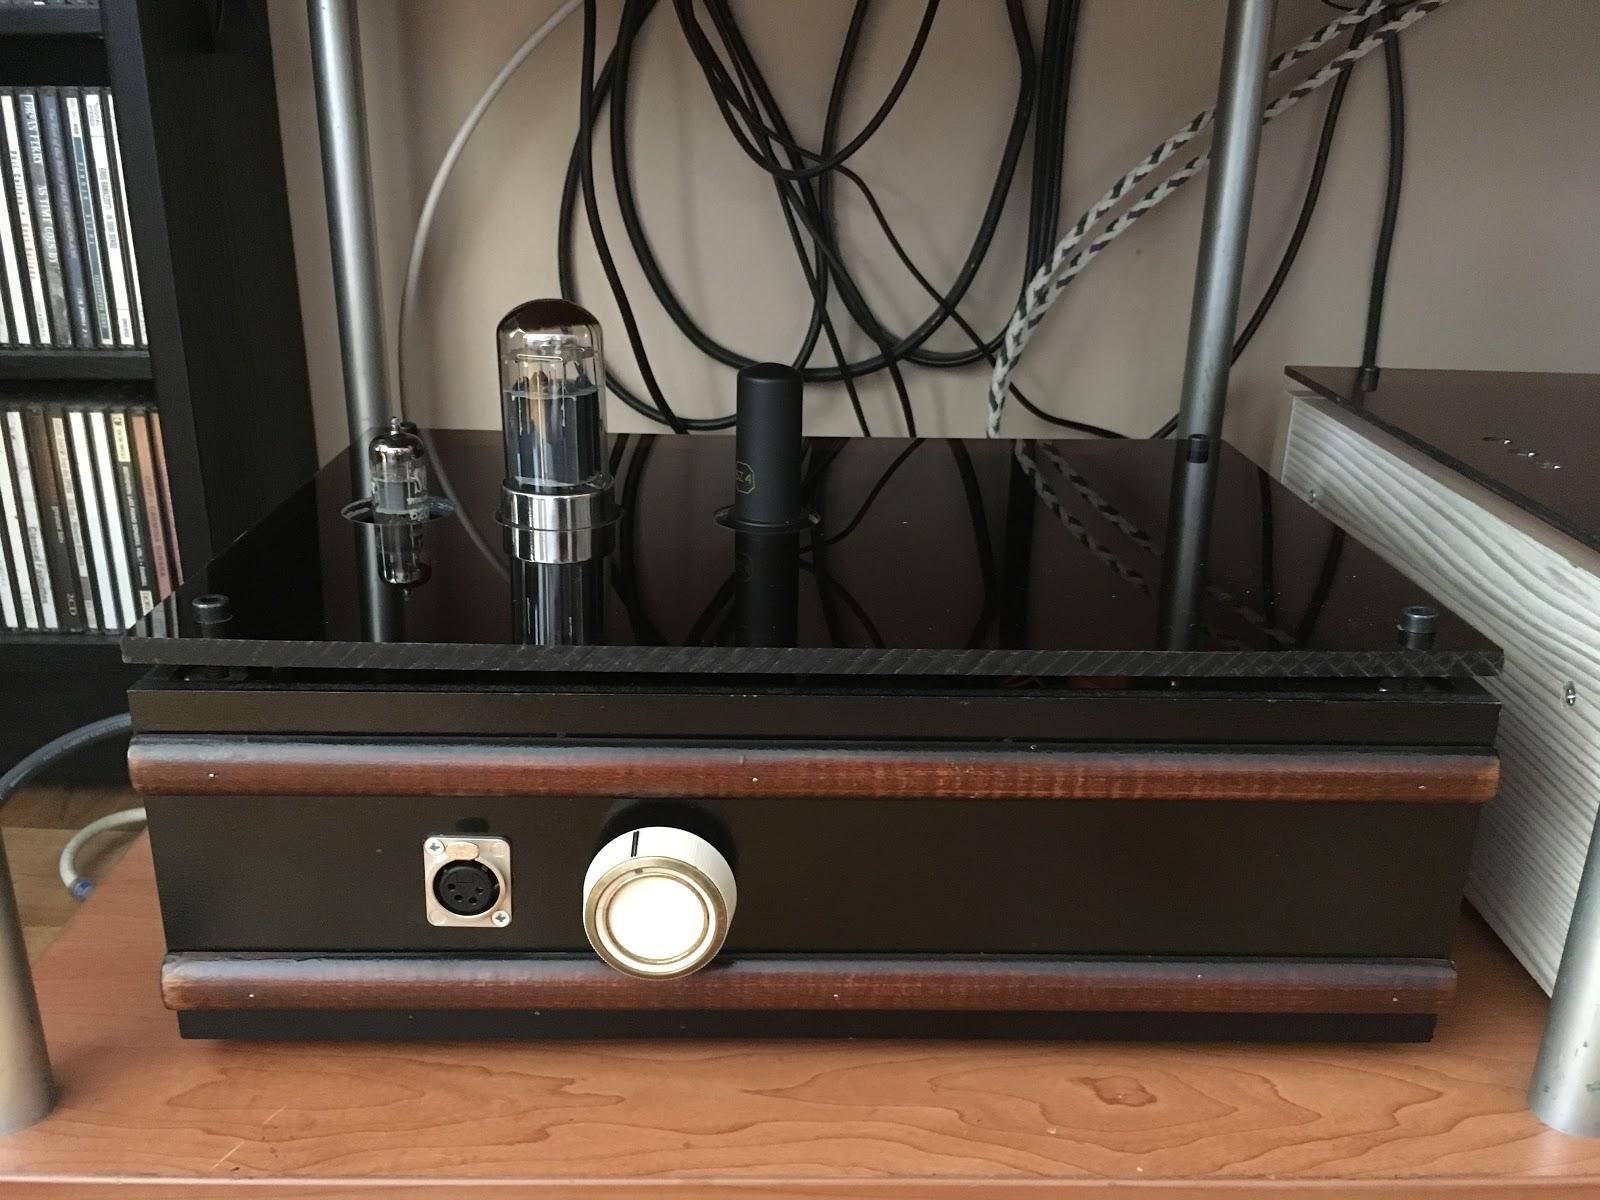 Rh Amplifiers Audio Power Amplifier Schematics 4w 8 Watt Amp